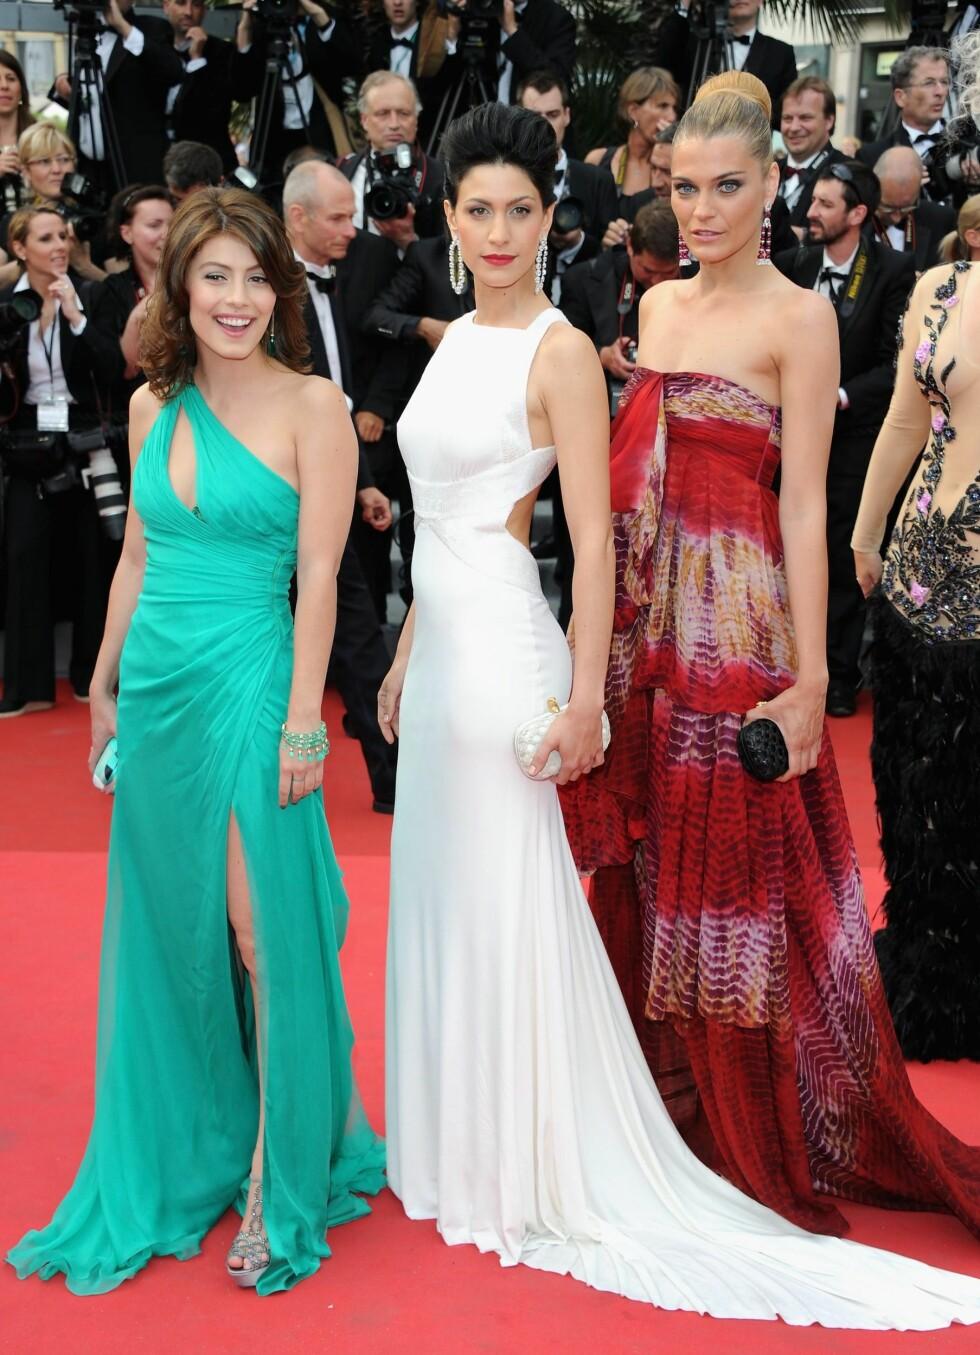 Dundas er også et hett navn blant italienere. Skuespillerne Alessandra Mastronardi, Giulia Bevilacqua and Claudia Zanella på premieren av Midnight In Paris i Cannes. Alle i Pucci. Foto: All Over Press